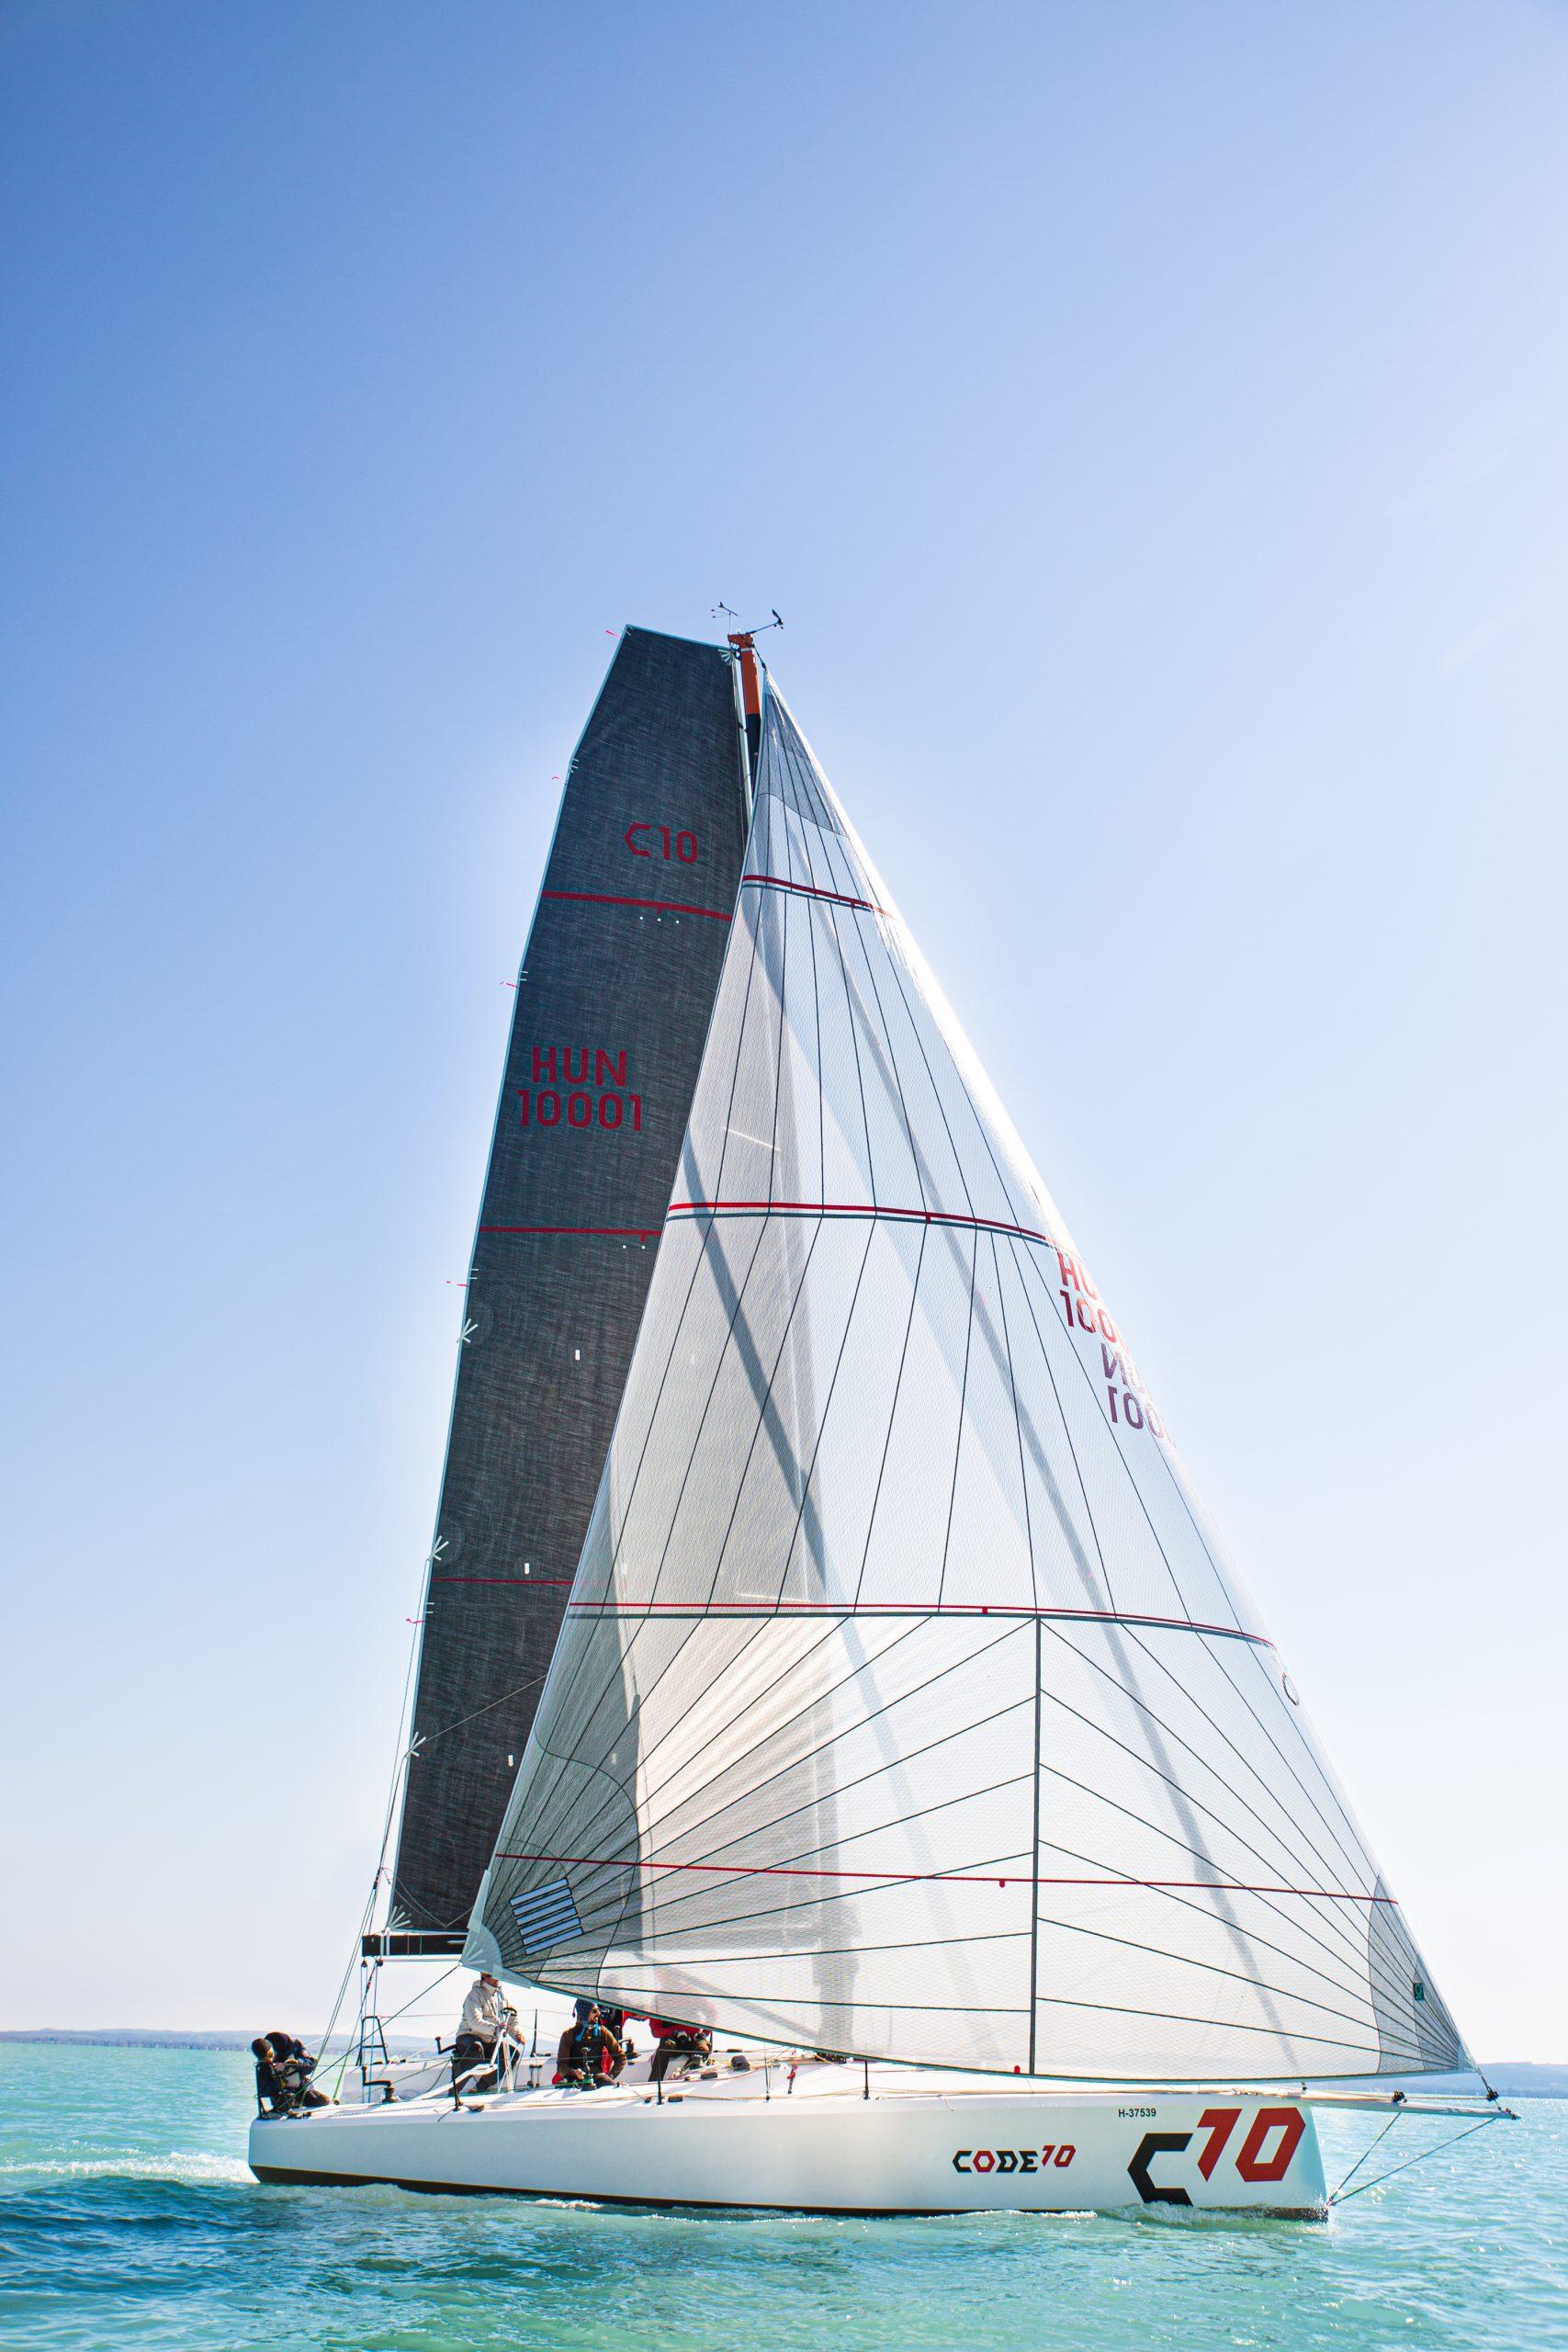 CODE10 sails - Code0